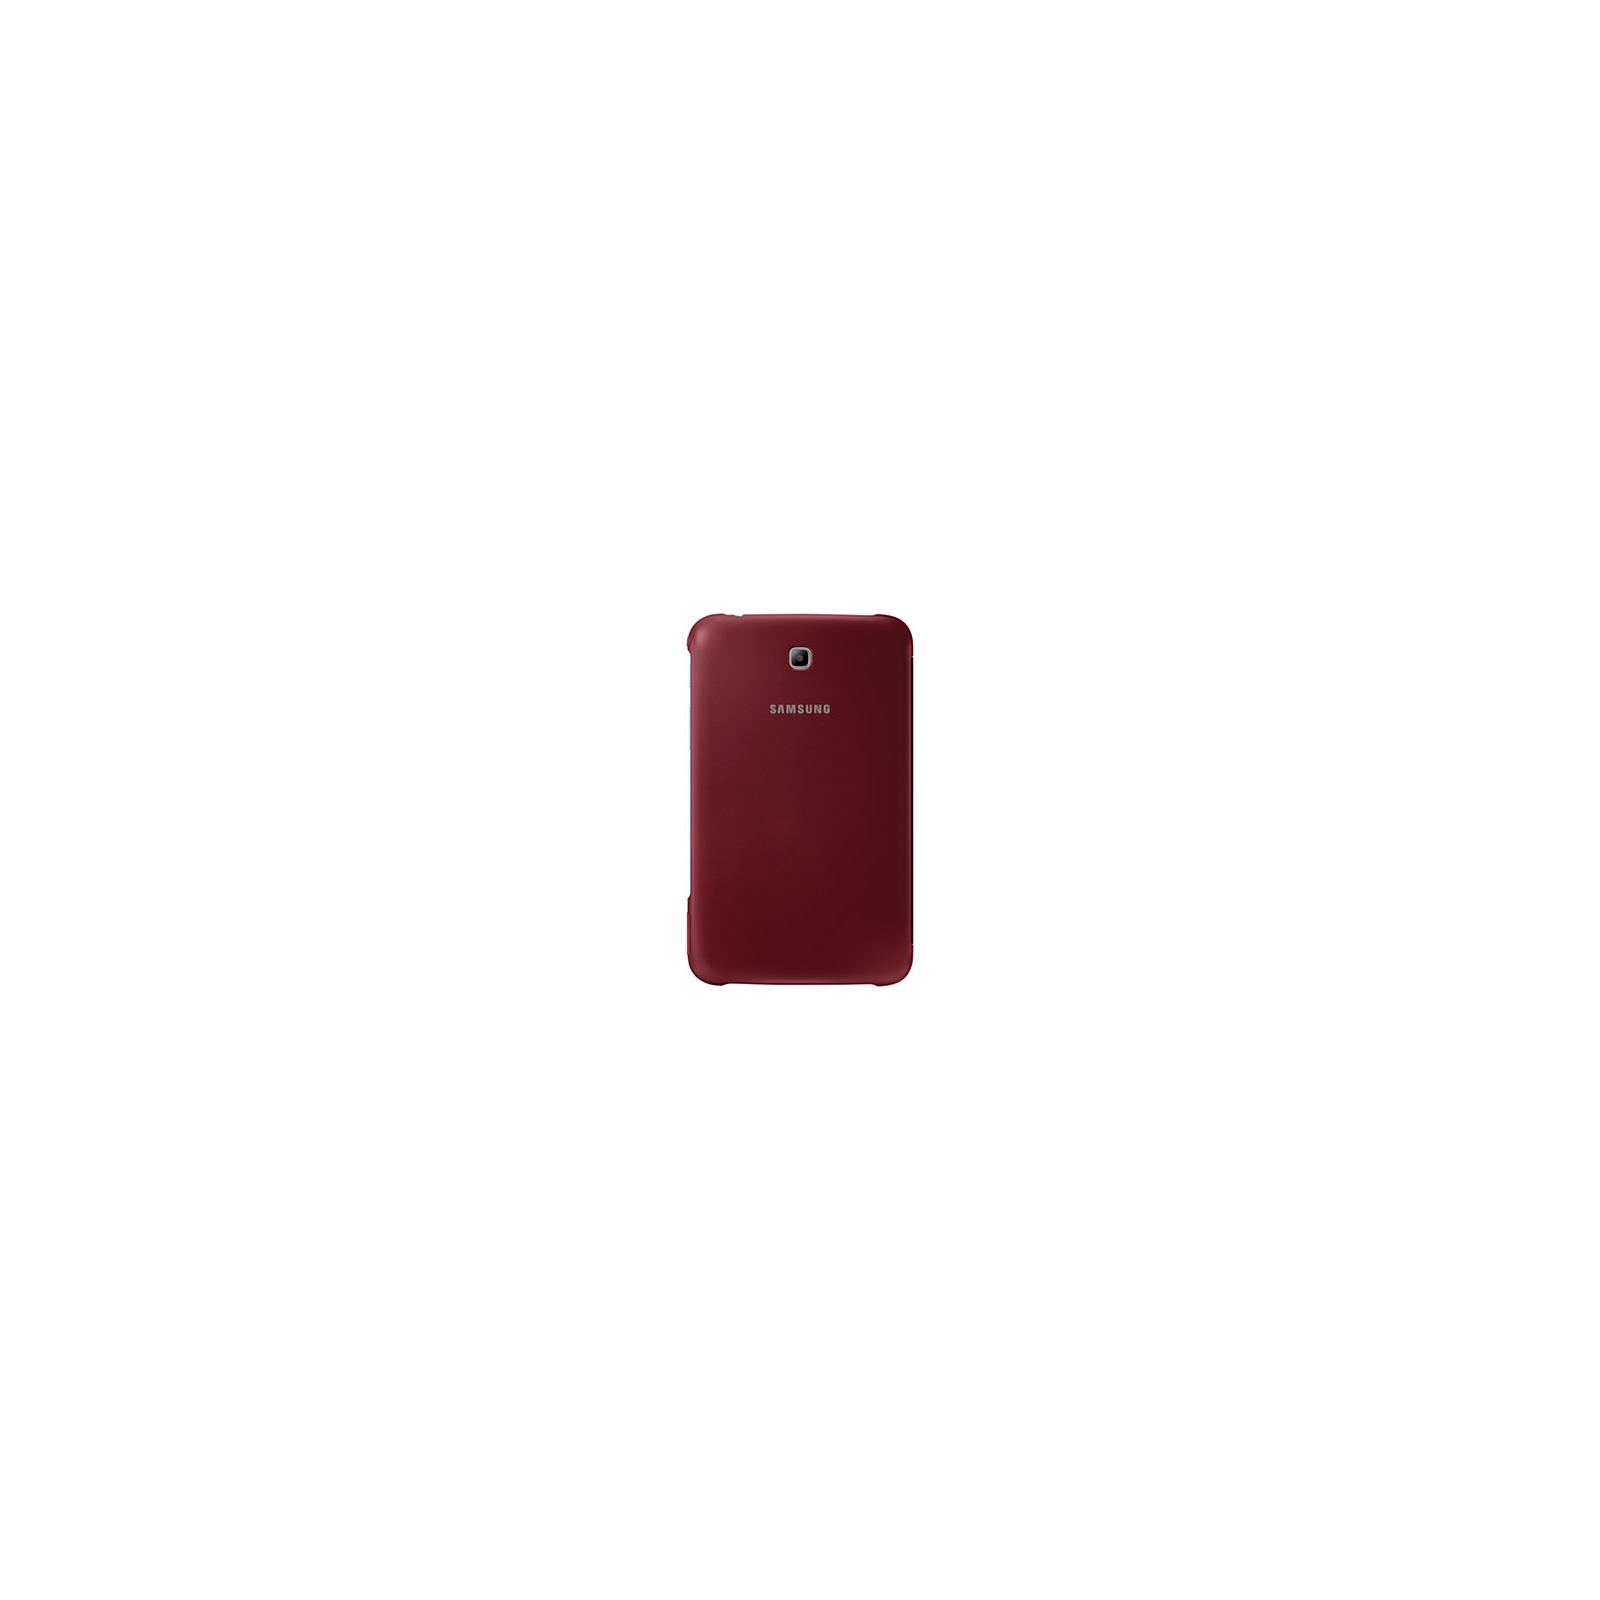 Чехол для планшета Samsung 7 GALAXY Tab 3 (EF-BT210BREGRU) изображение 2